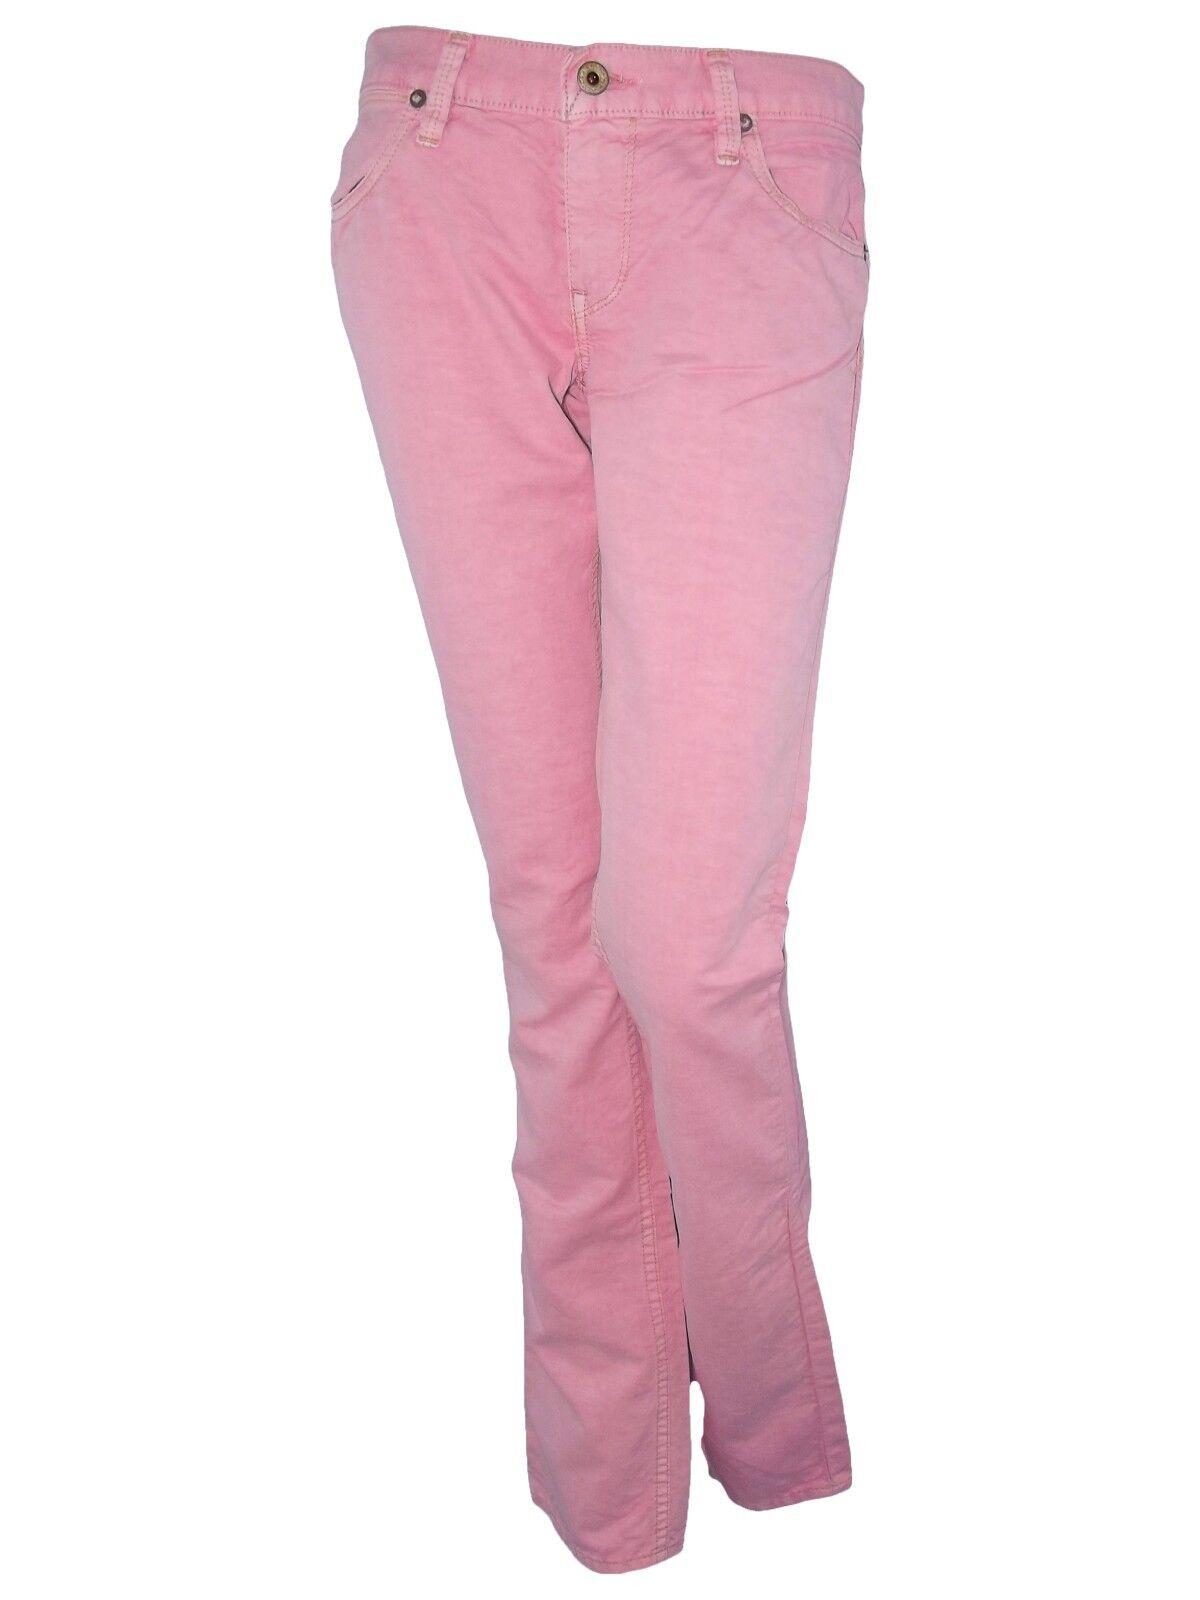 Ralph lauren donna jeans pantalone denim p e rosa avviocut taglia 40 41 w 26 27